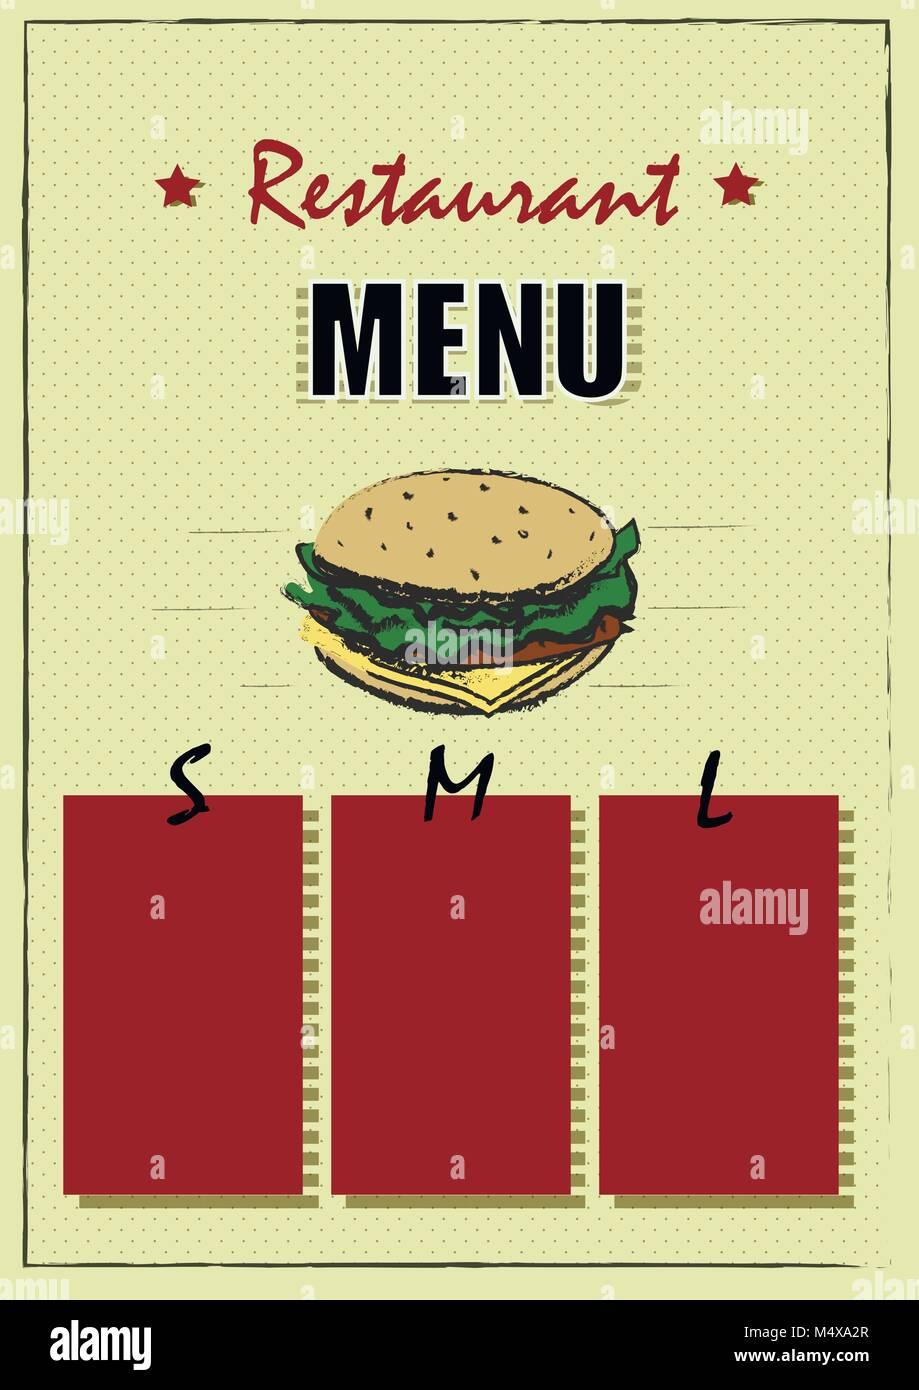 Restaurant Brochure Vector Menu Design Vector Cafe Template With